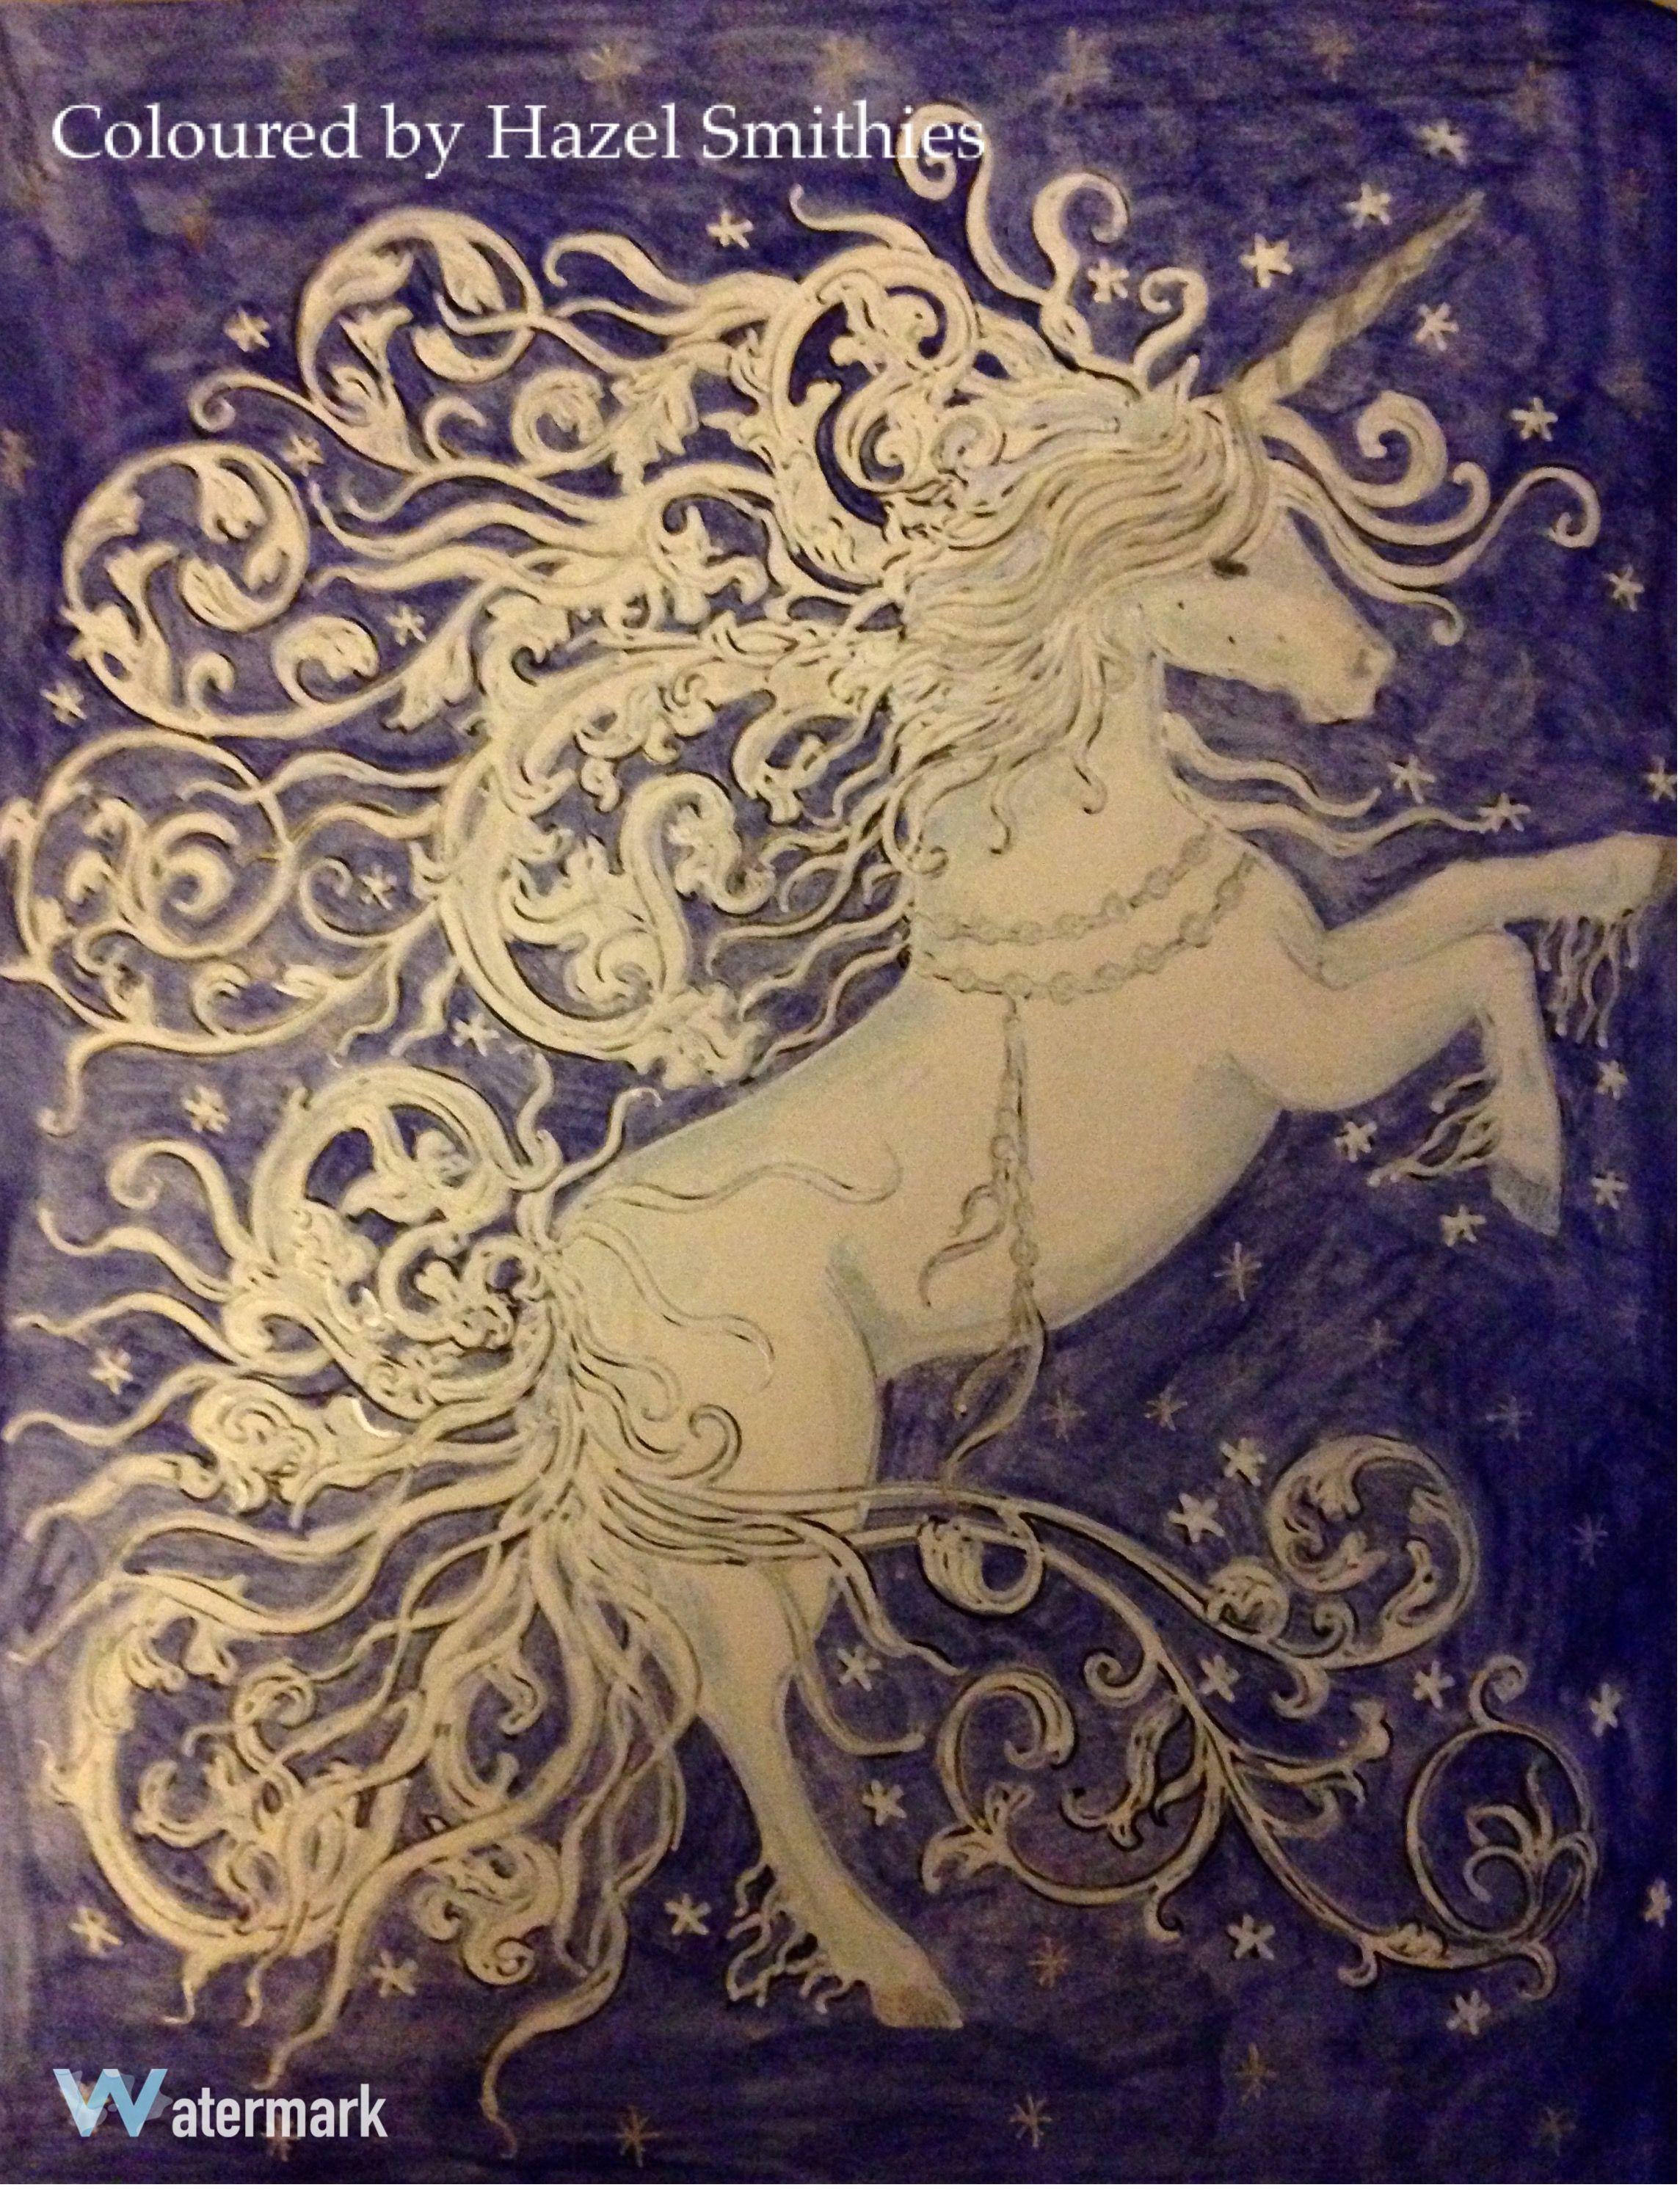 Unicorn From Dagdrommar By Hanna Karlzon In Inktense Pencil, Posca